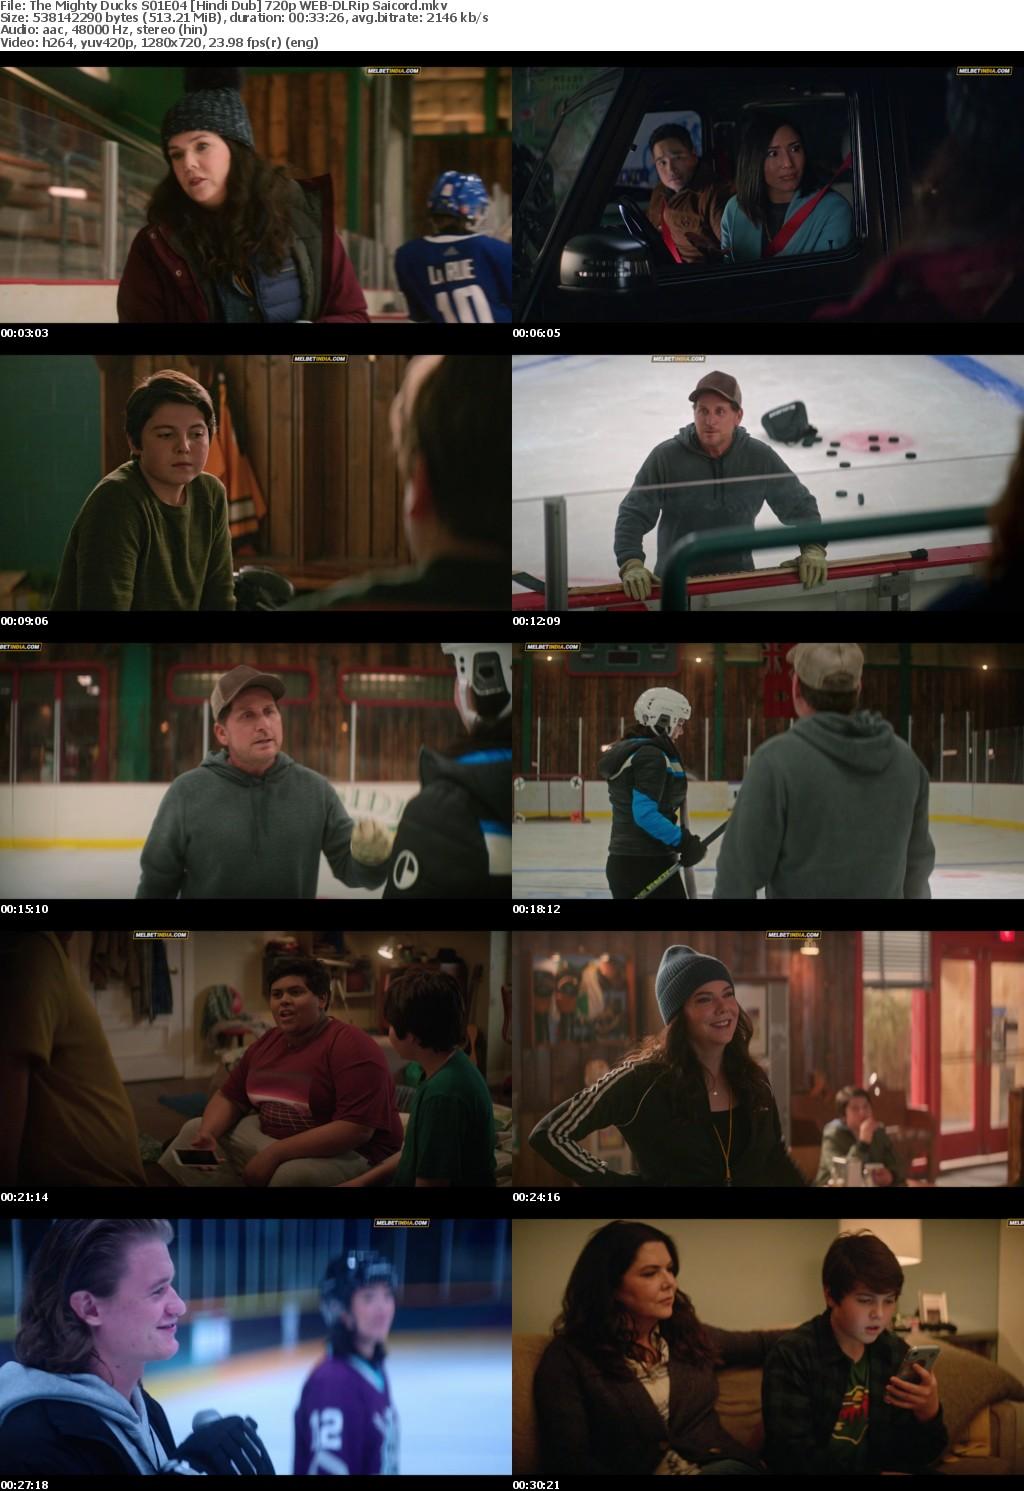 The Mighty Ducks: Game Changers S01 Hindi Dub 720p WEB-DLRip Saicord